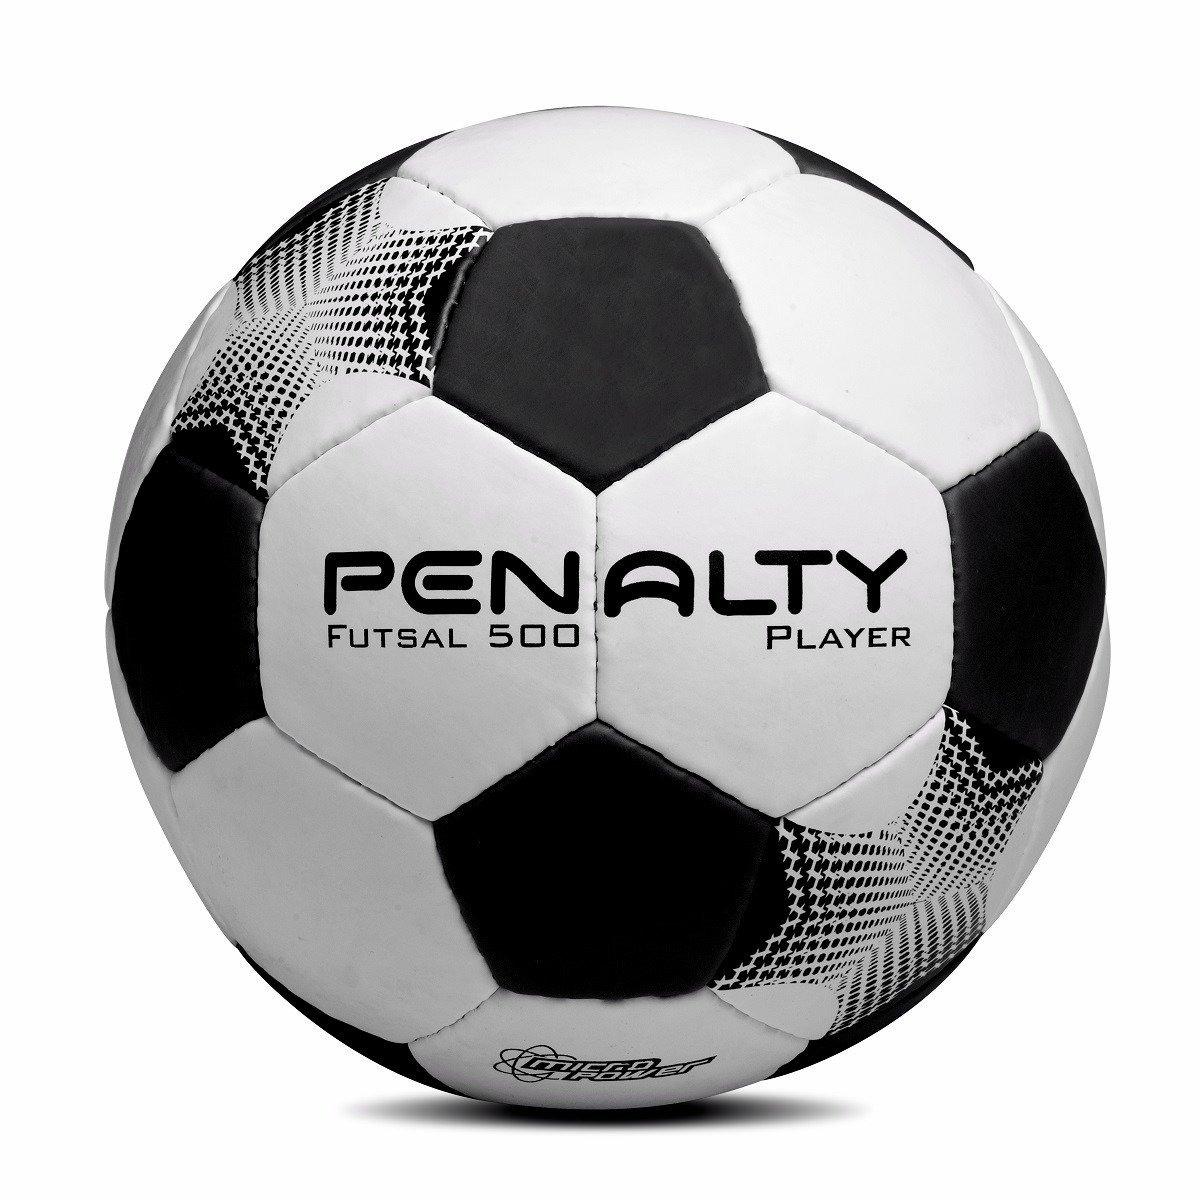 2fc189cf6e23e Bola Futsal Penalty Player Vii 510825 - 1 - Padrão - R  84